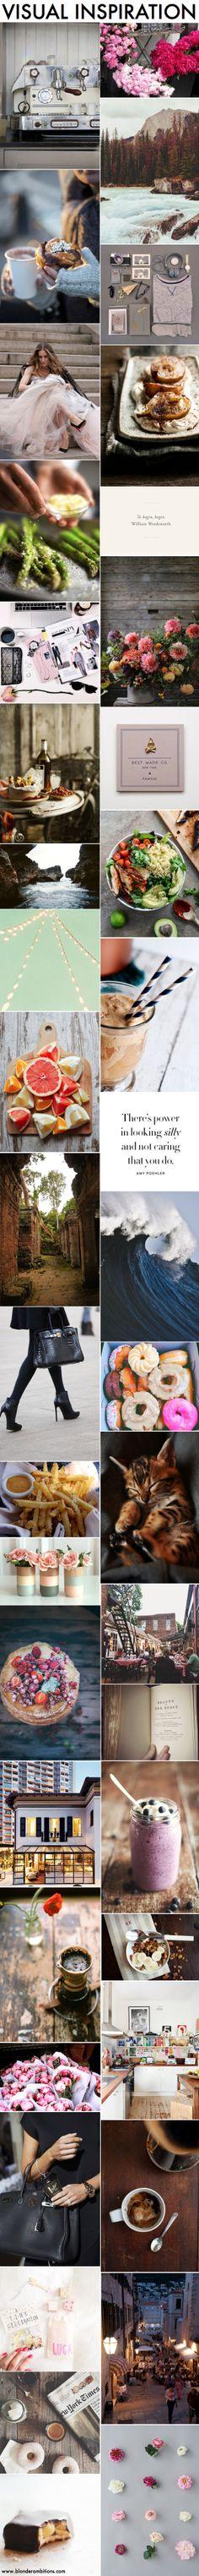 BLONDER AMBITIONS | VISUAL INSPIRATION. fashion. blog. fashion blog. lifestyle. travel. nature. organization. coffee. luxury. pink. feminine. classic. style.